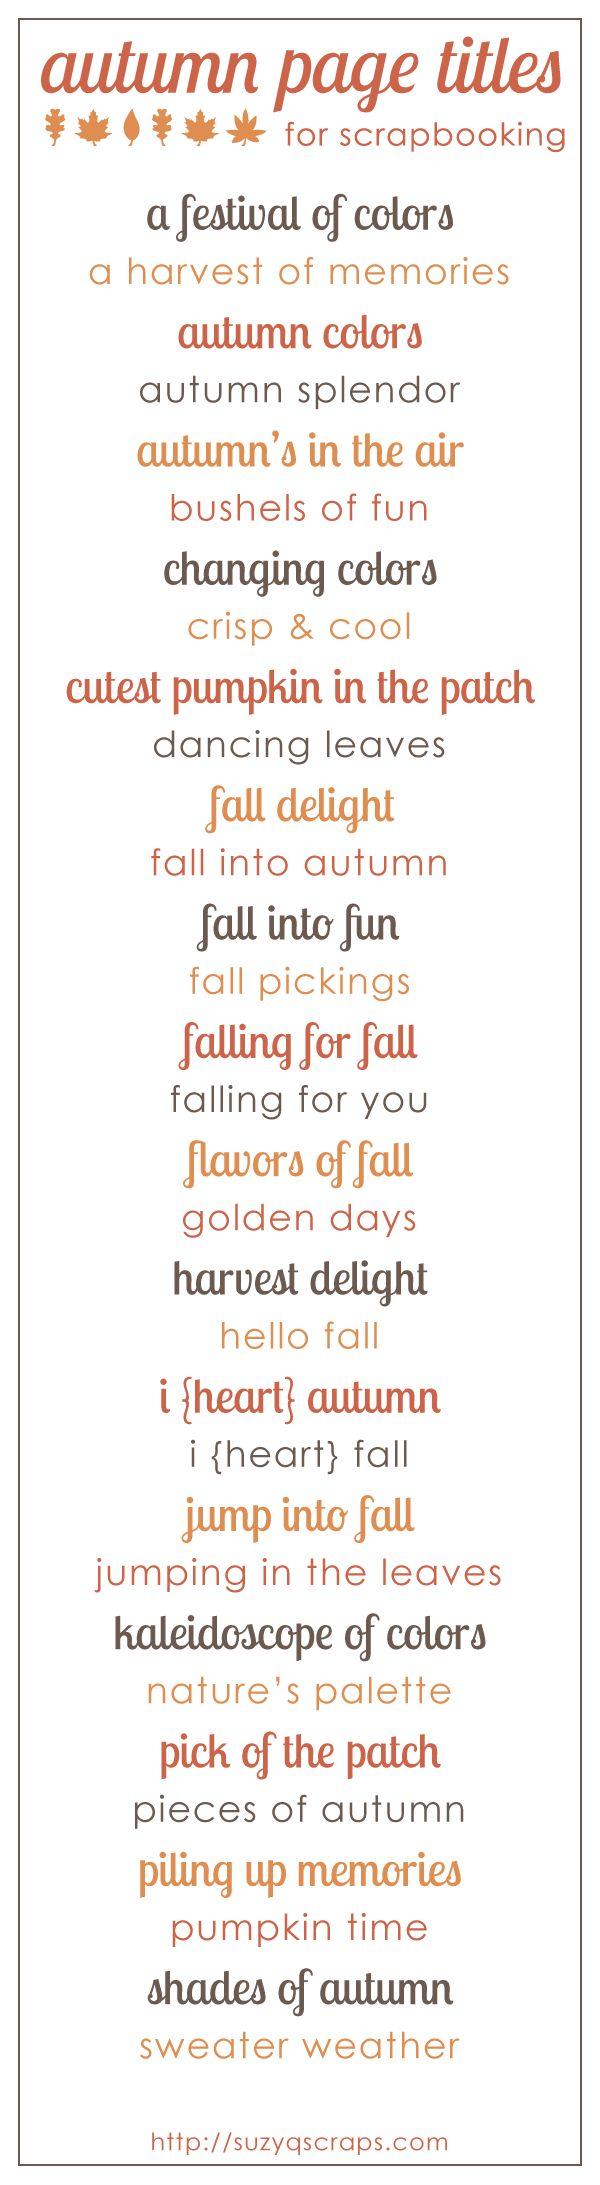 12 Autumn Scrapbook Page Ideas – Scrap Booking